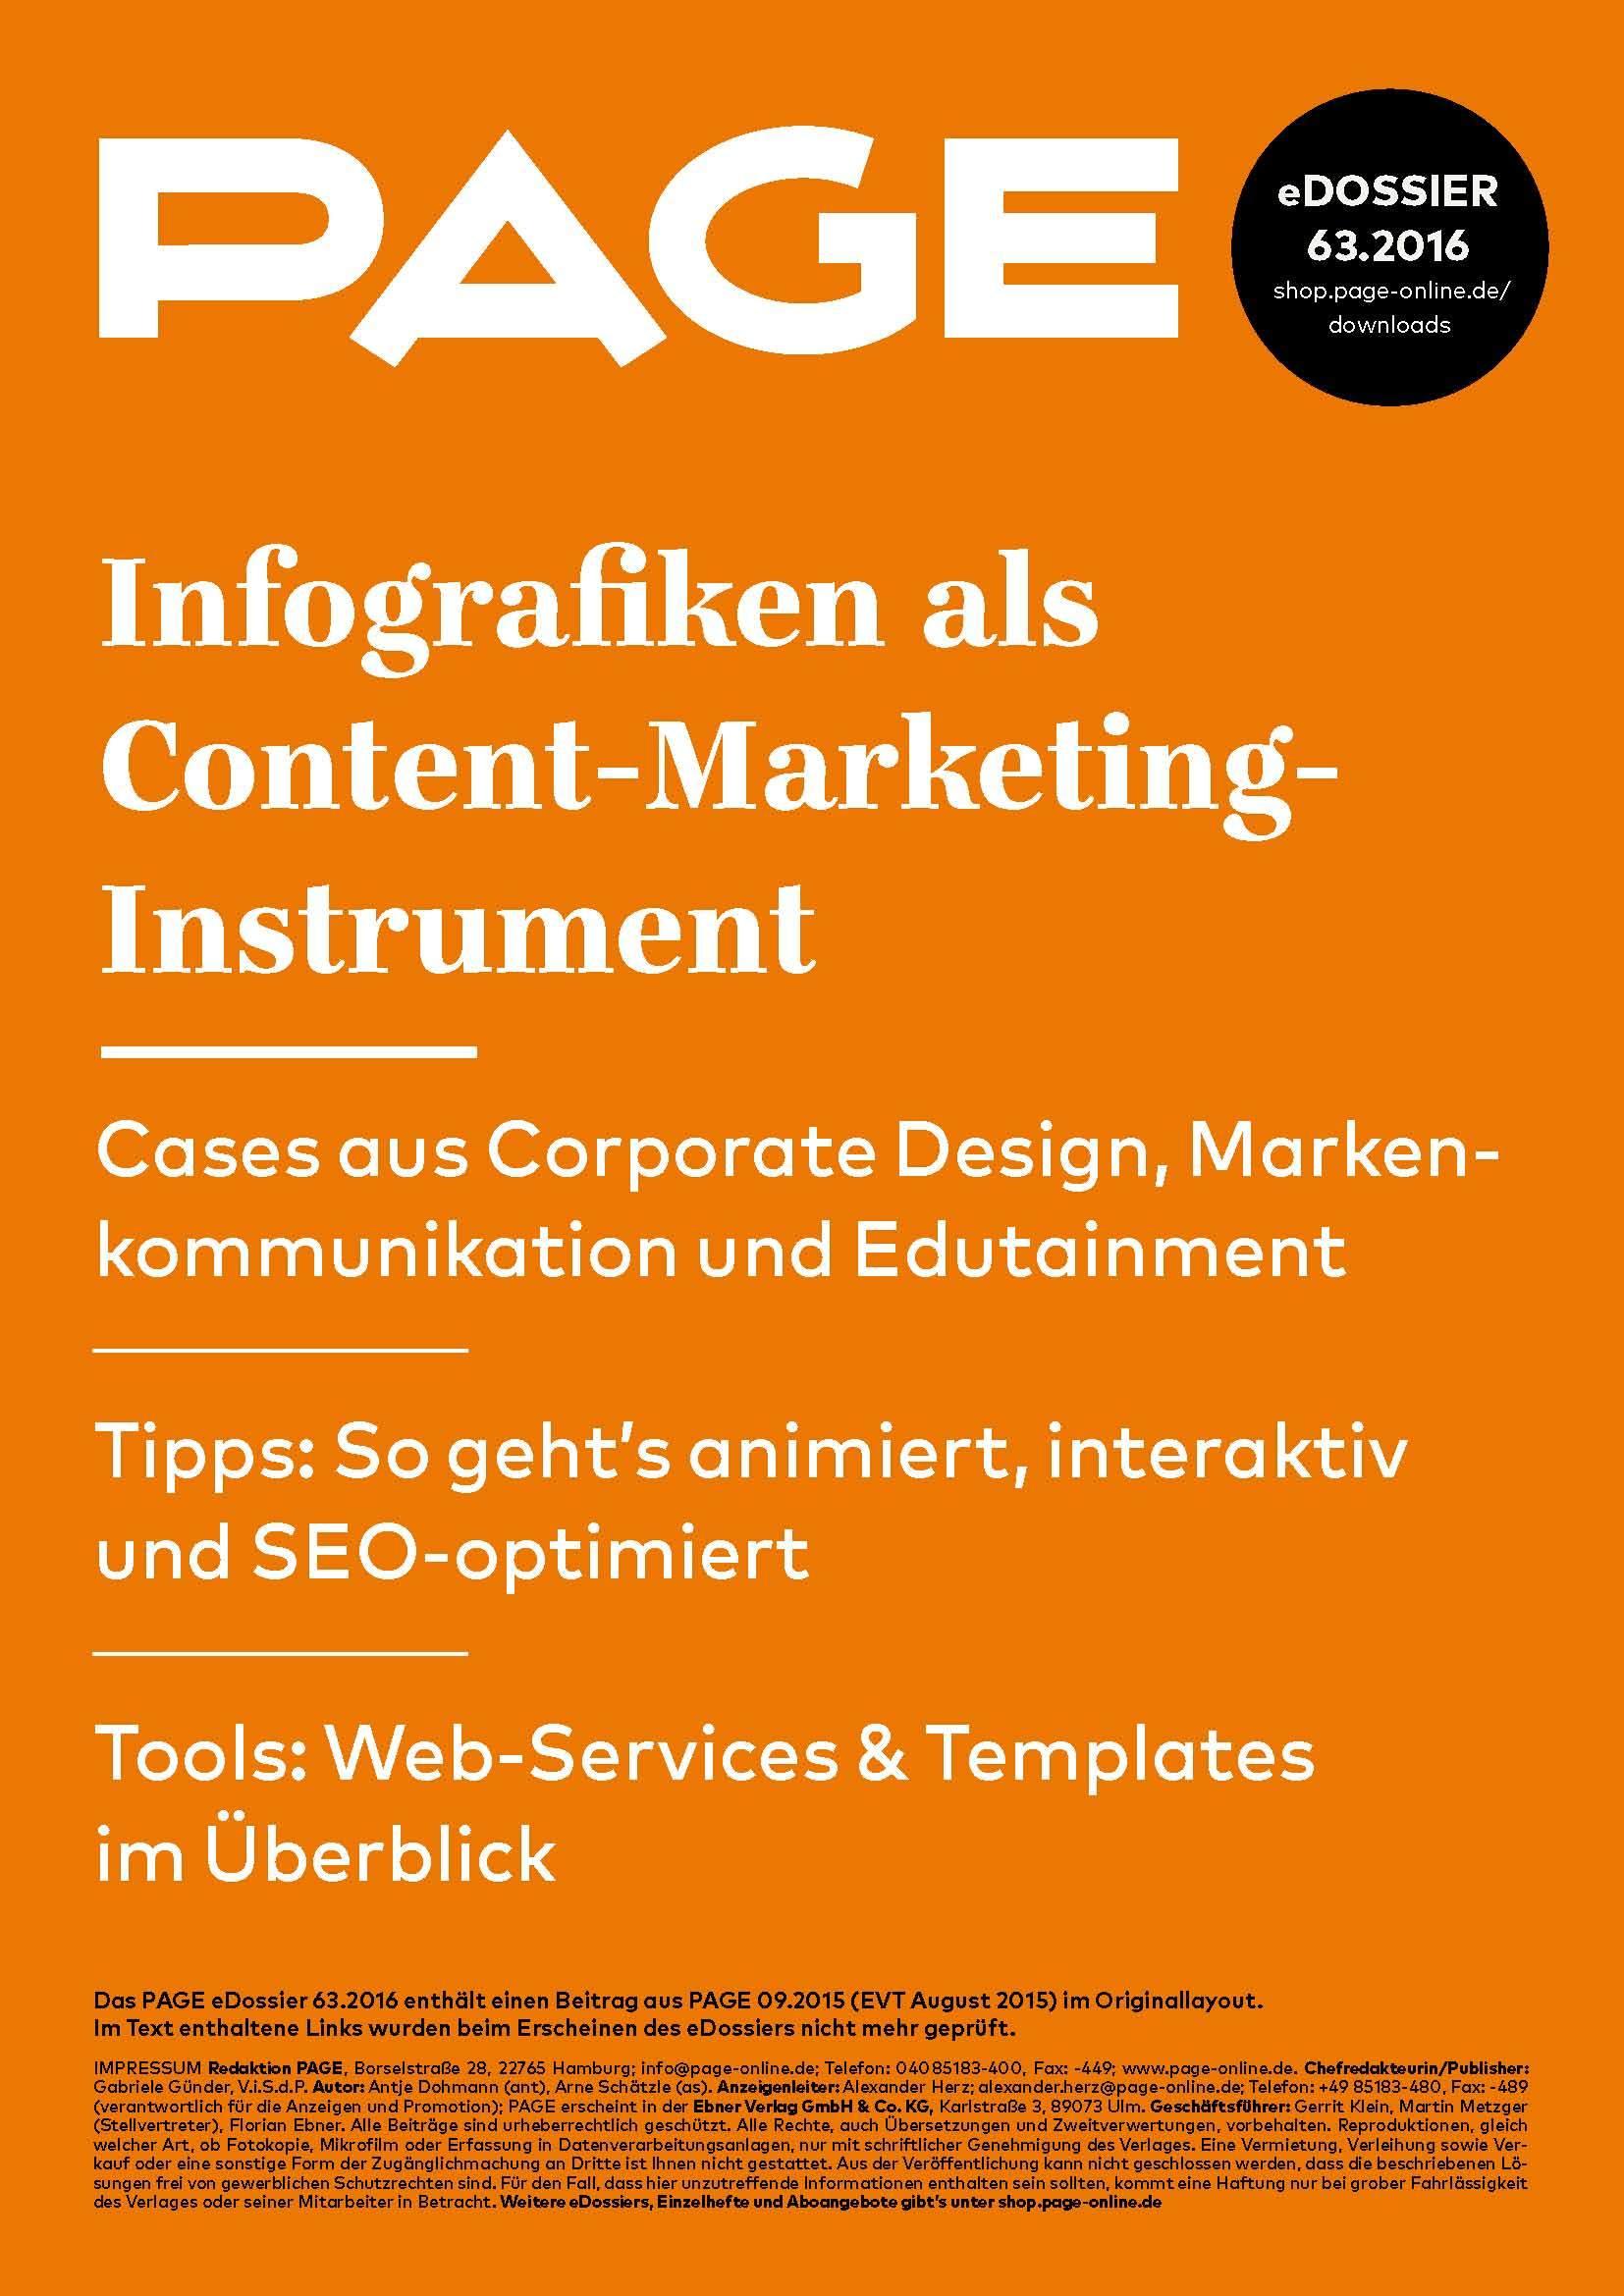 Infografik erstellen, Grafikdesign, Kommunikationsdesign, Piktogramme, animierte Gifs